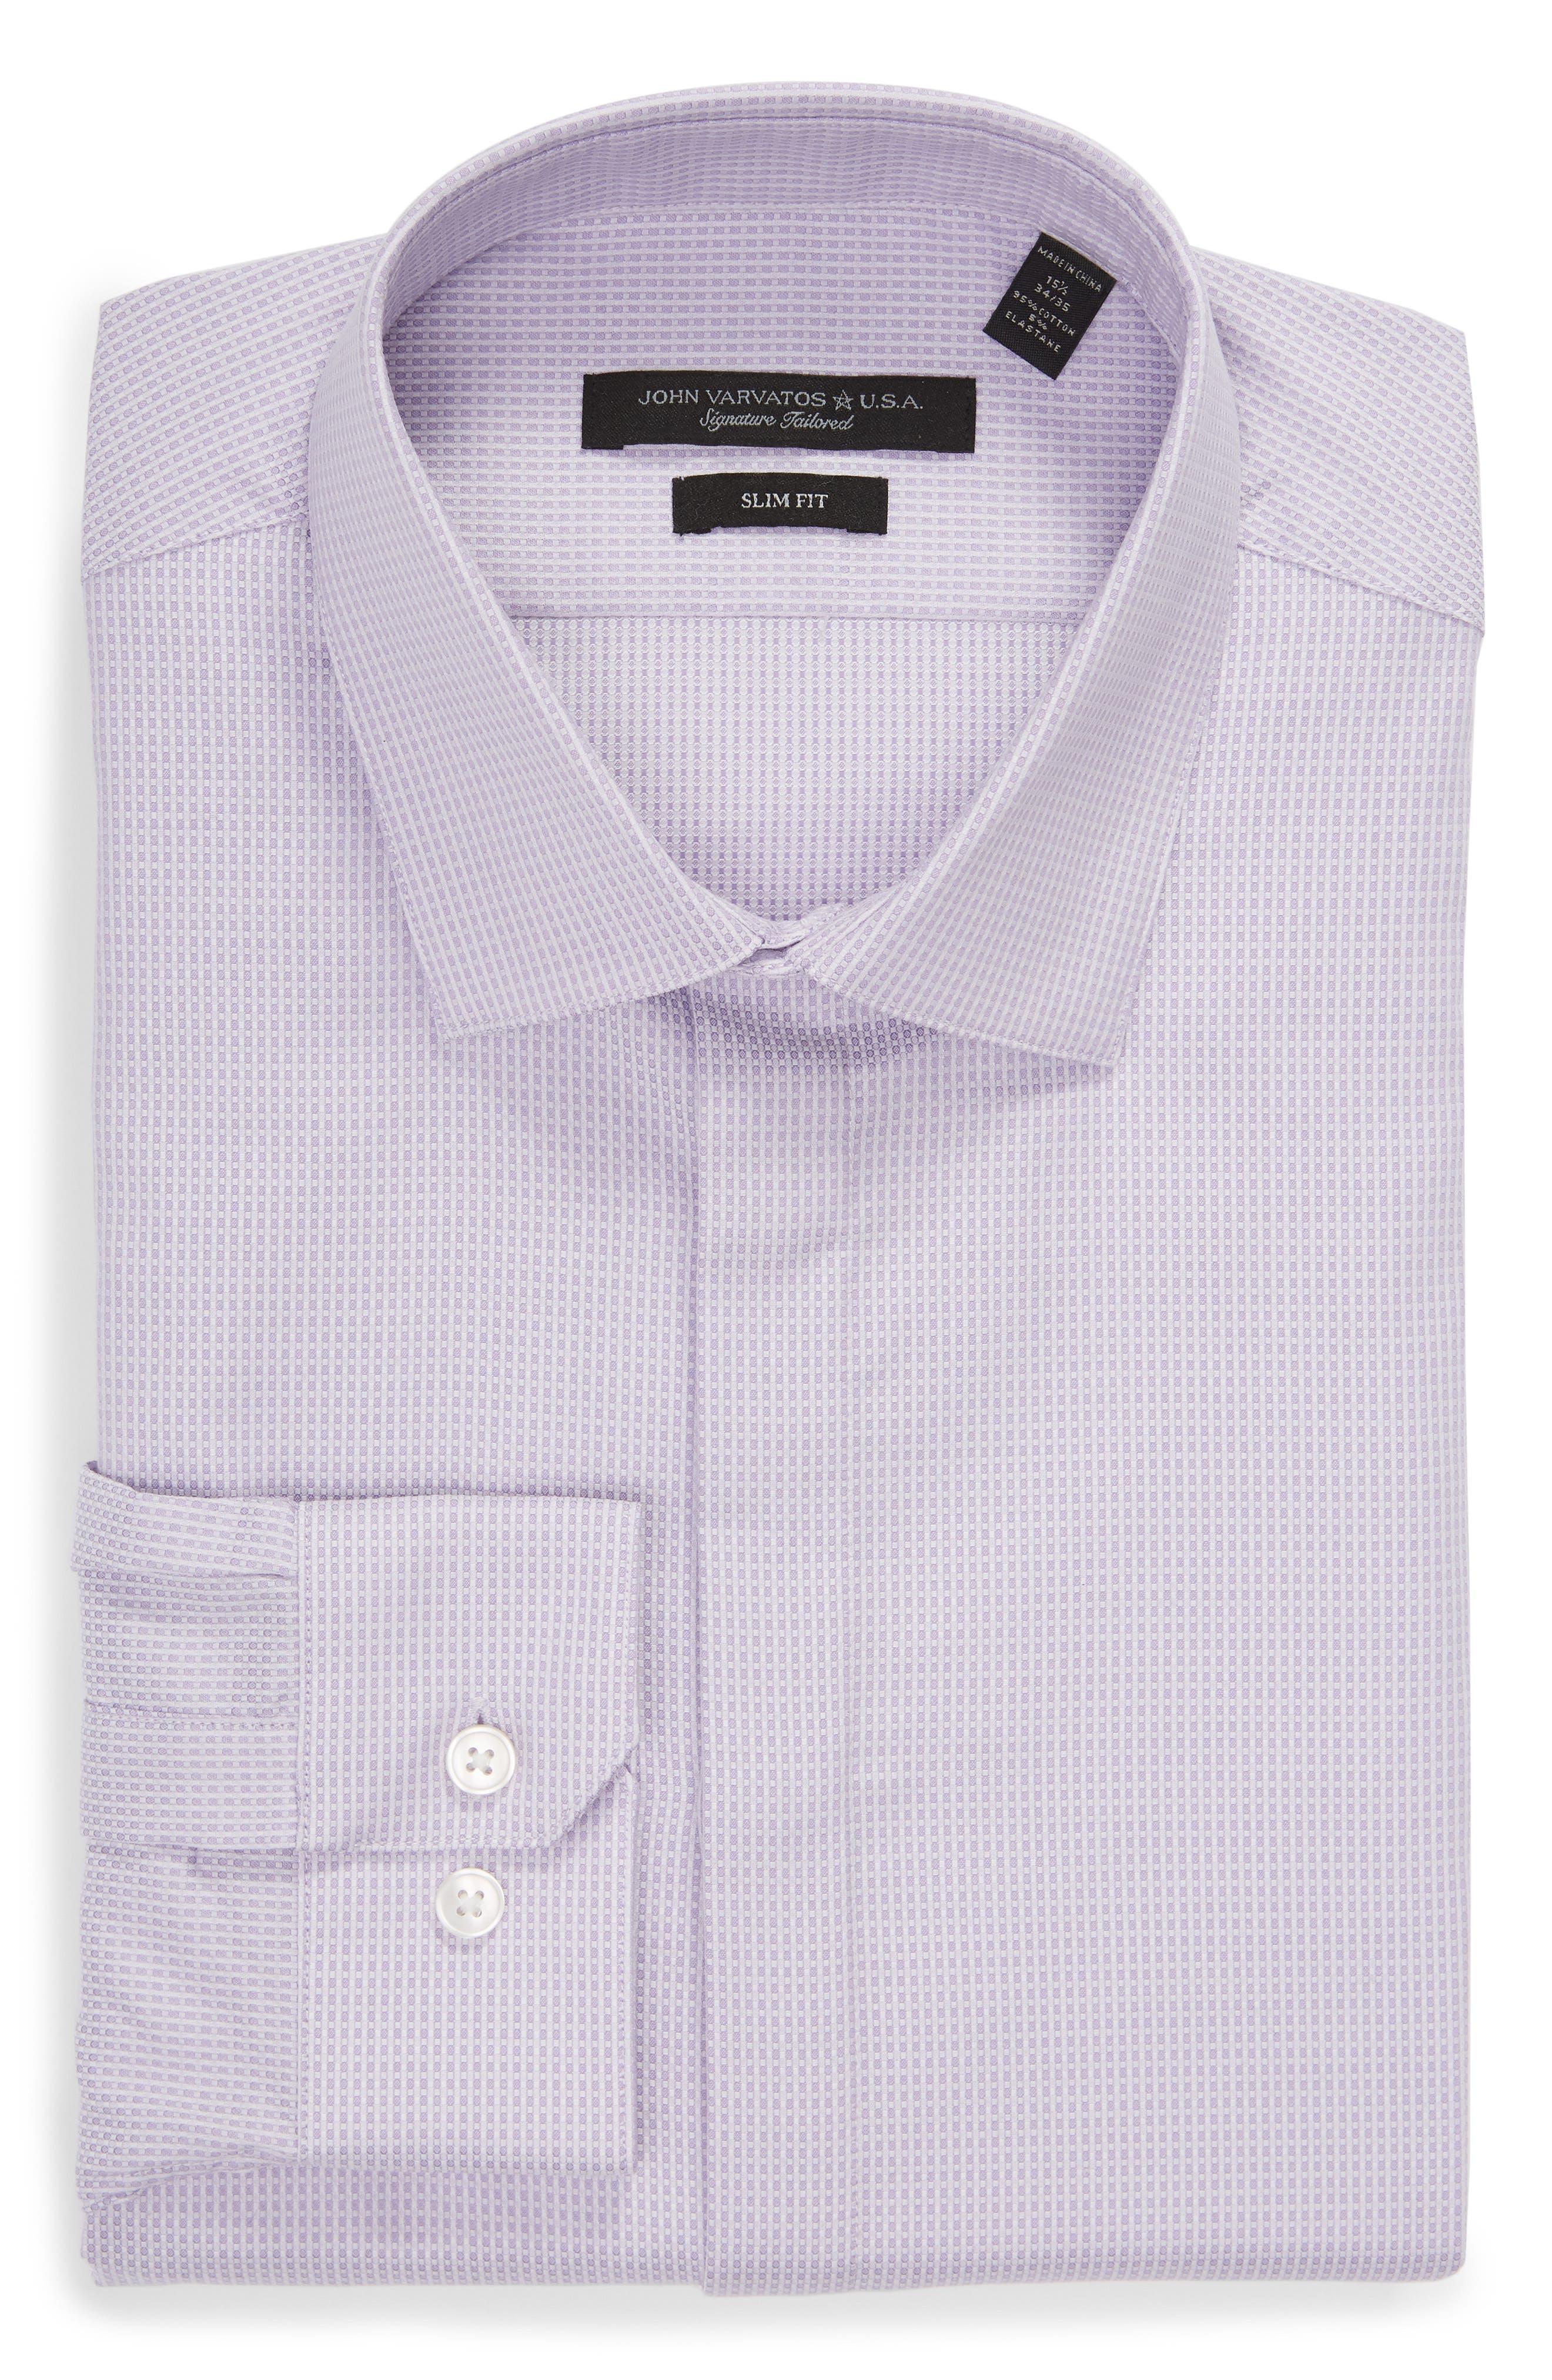 Slim Fit Stretch Check Dress Shirt,                             Alternate thumbnail 5, color,                             LAVENDER